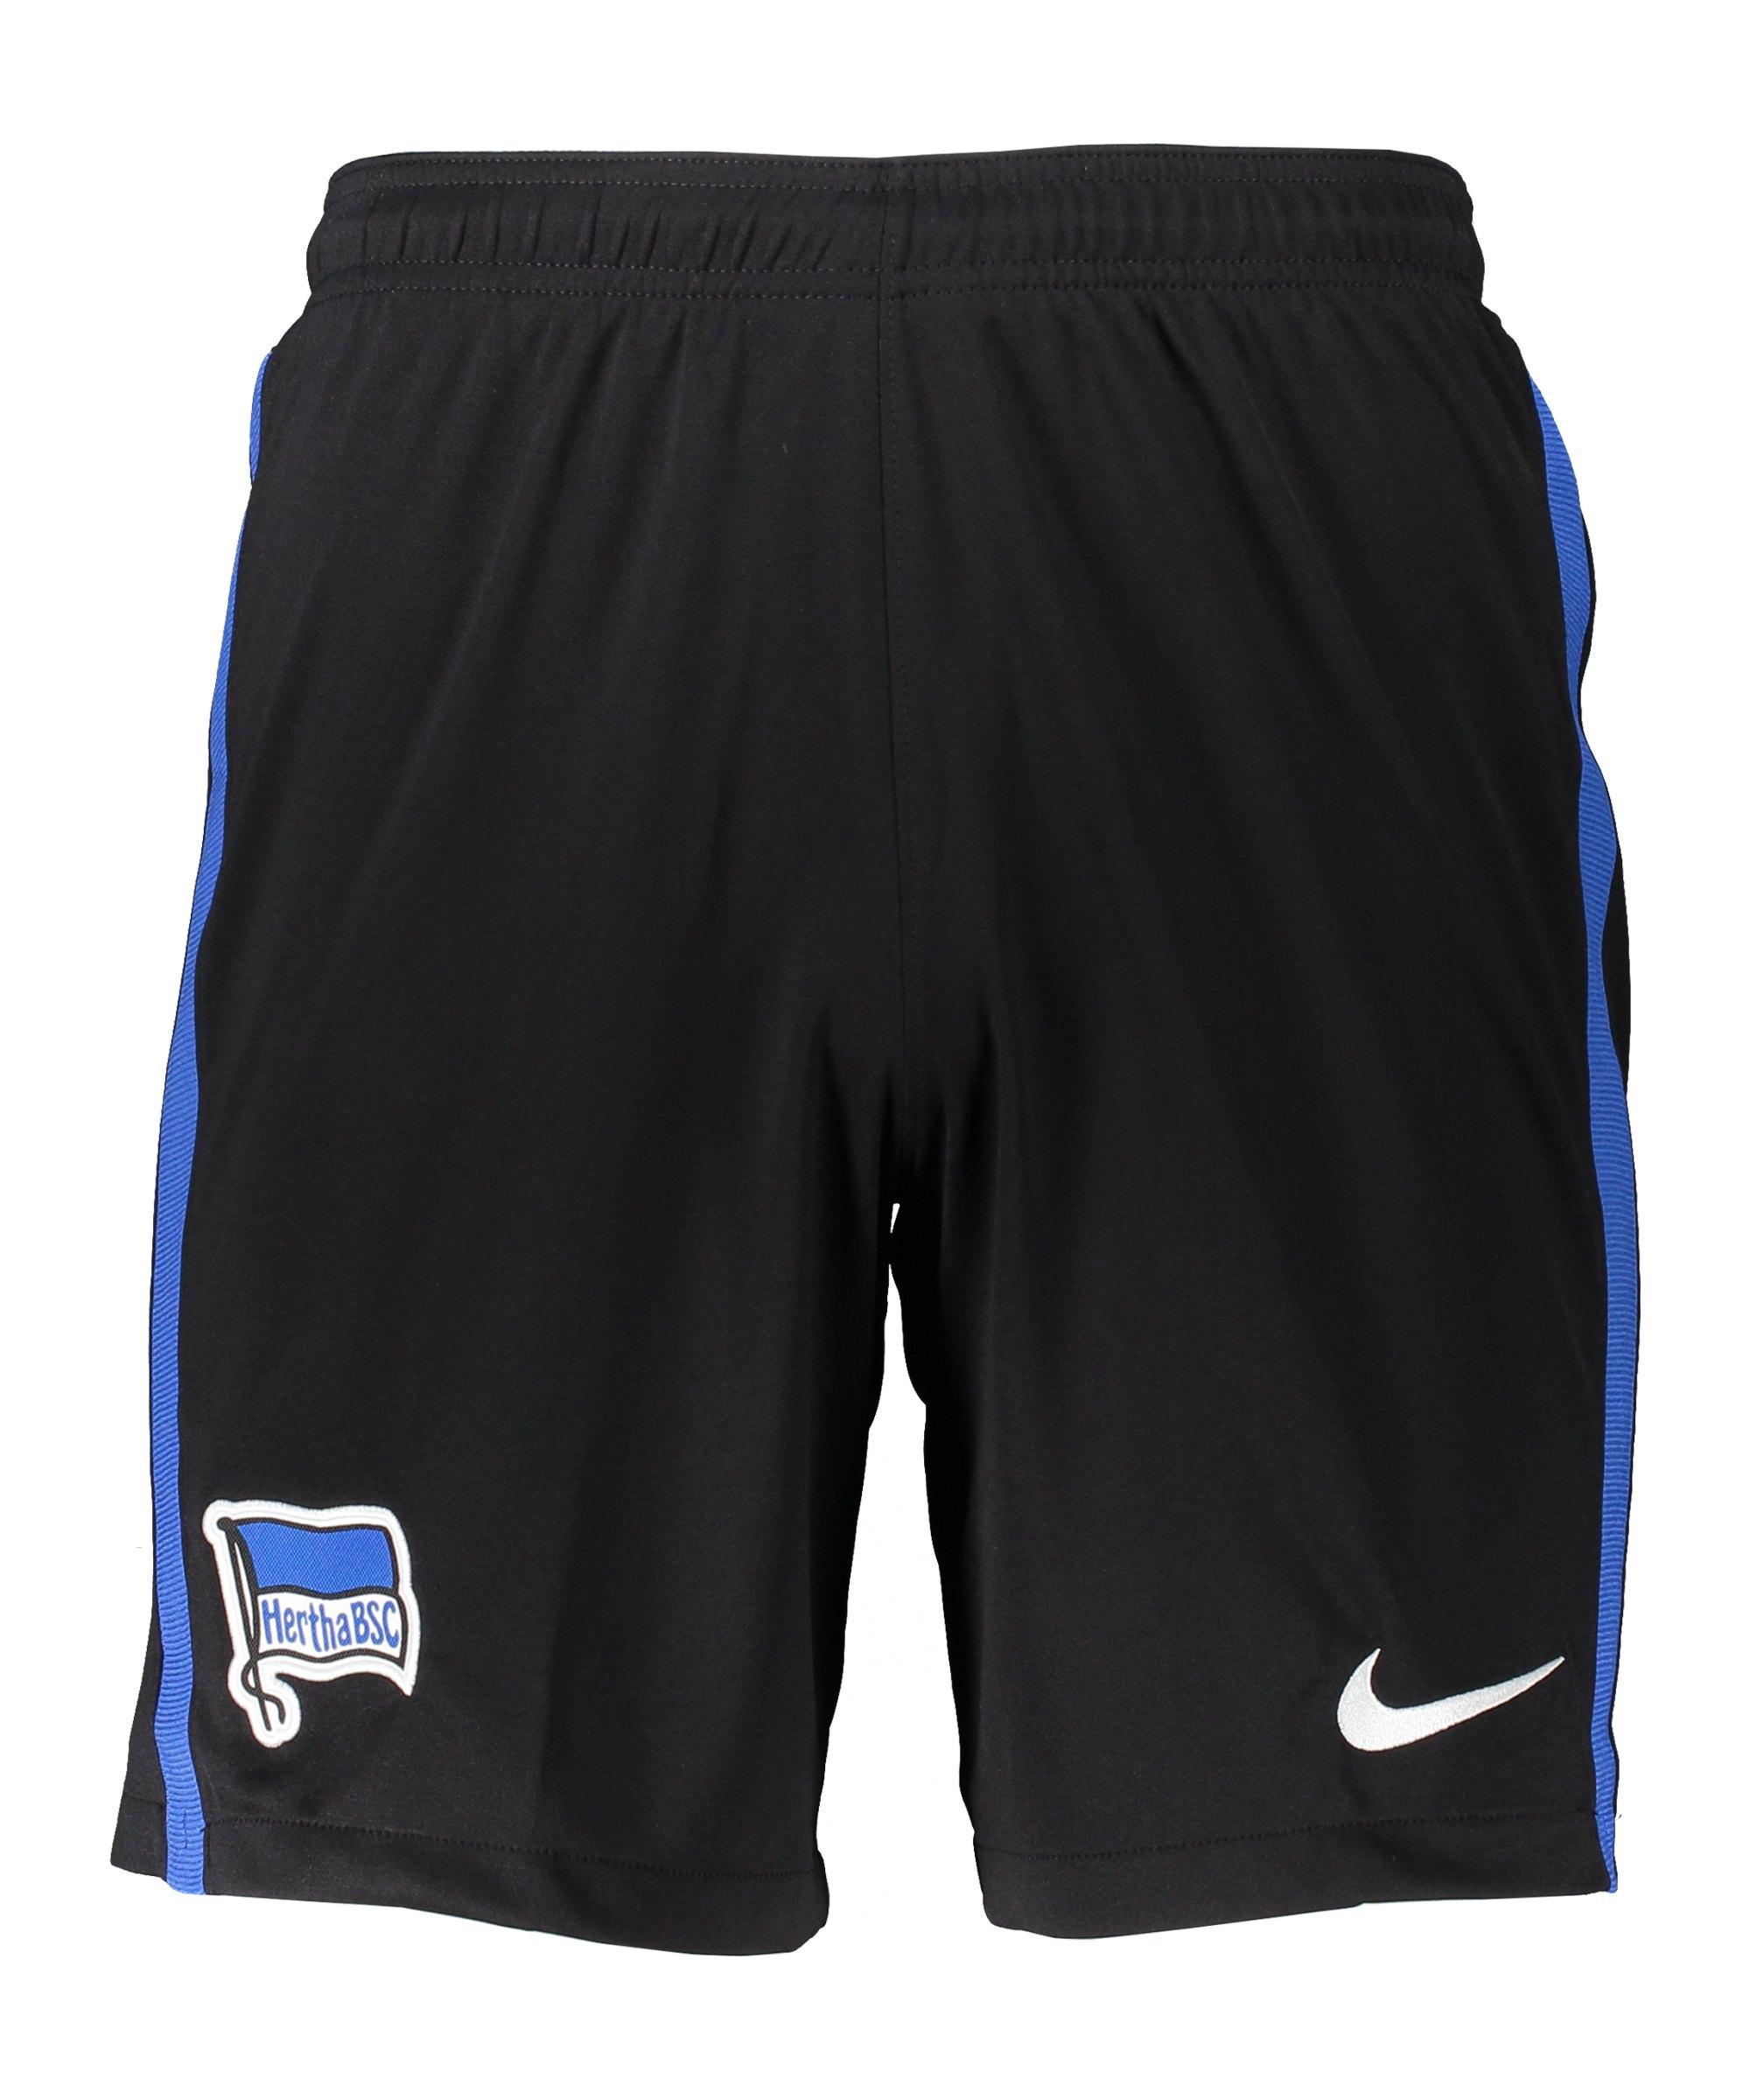 Nike Hertha BSC Berlin Short Away 2020/2021 Schwarz F010 - schwarz